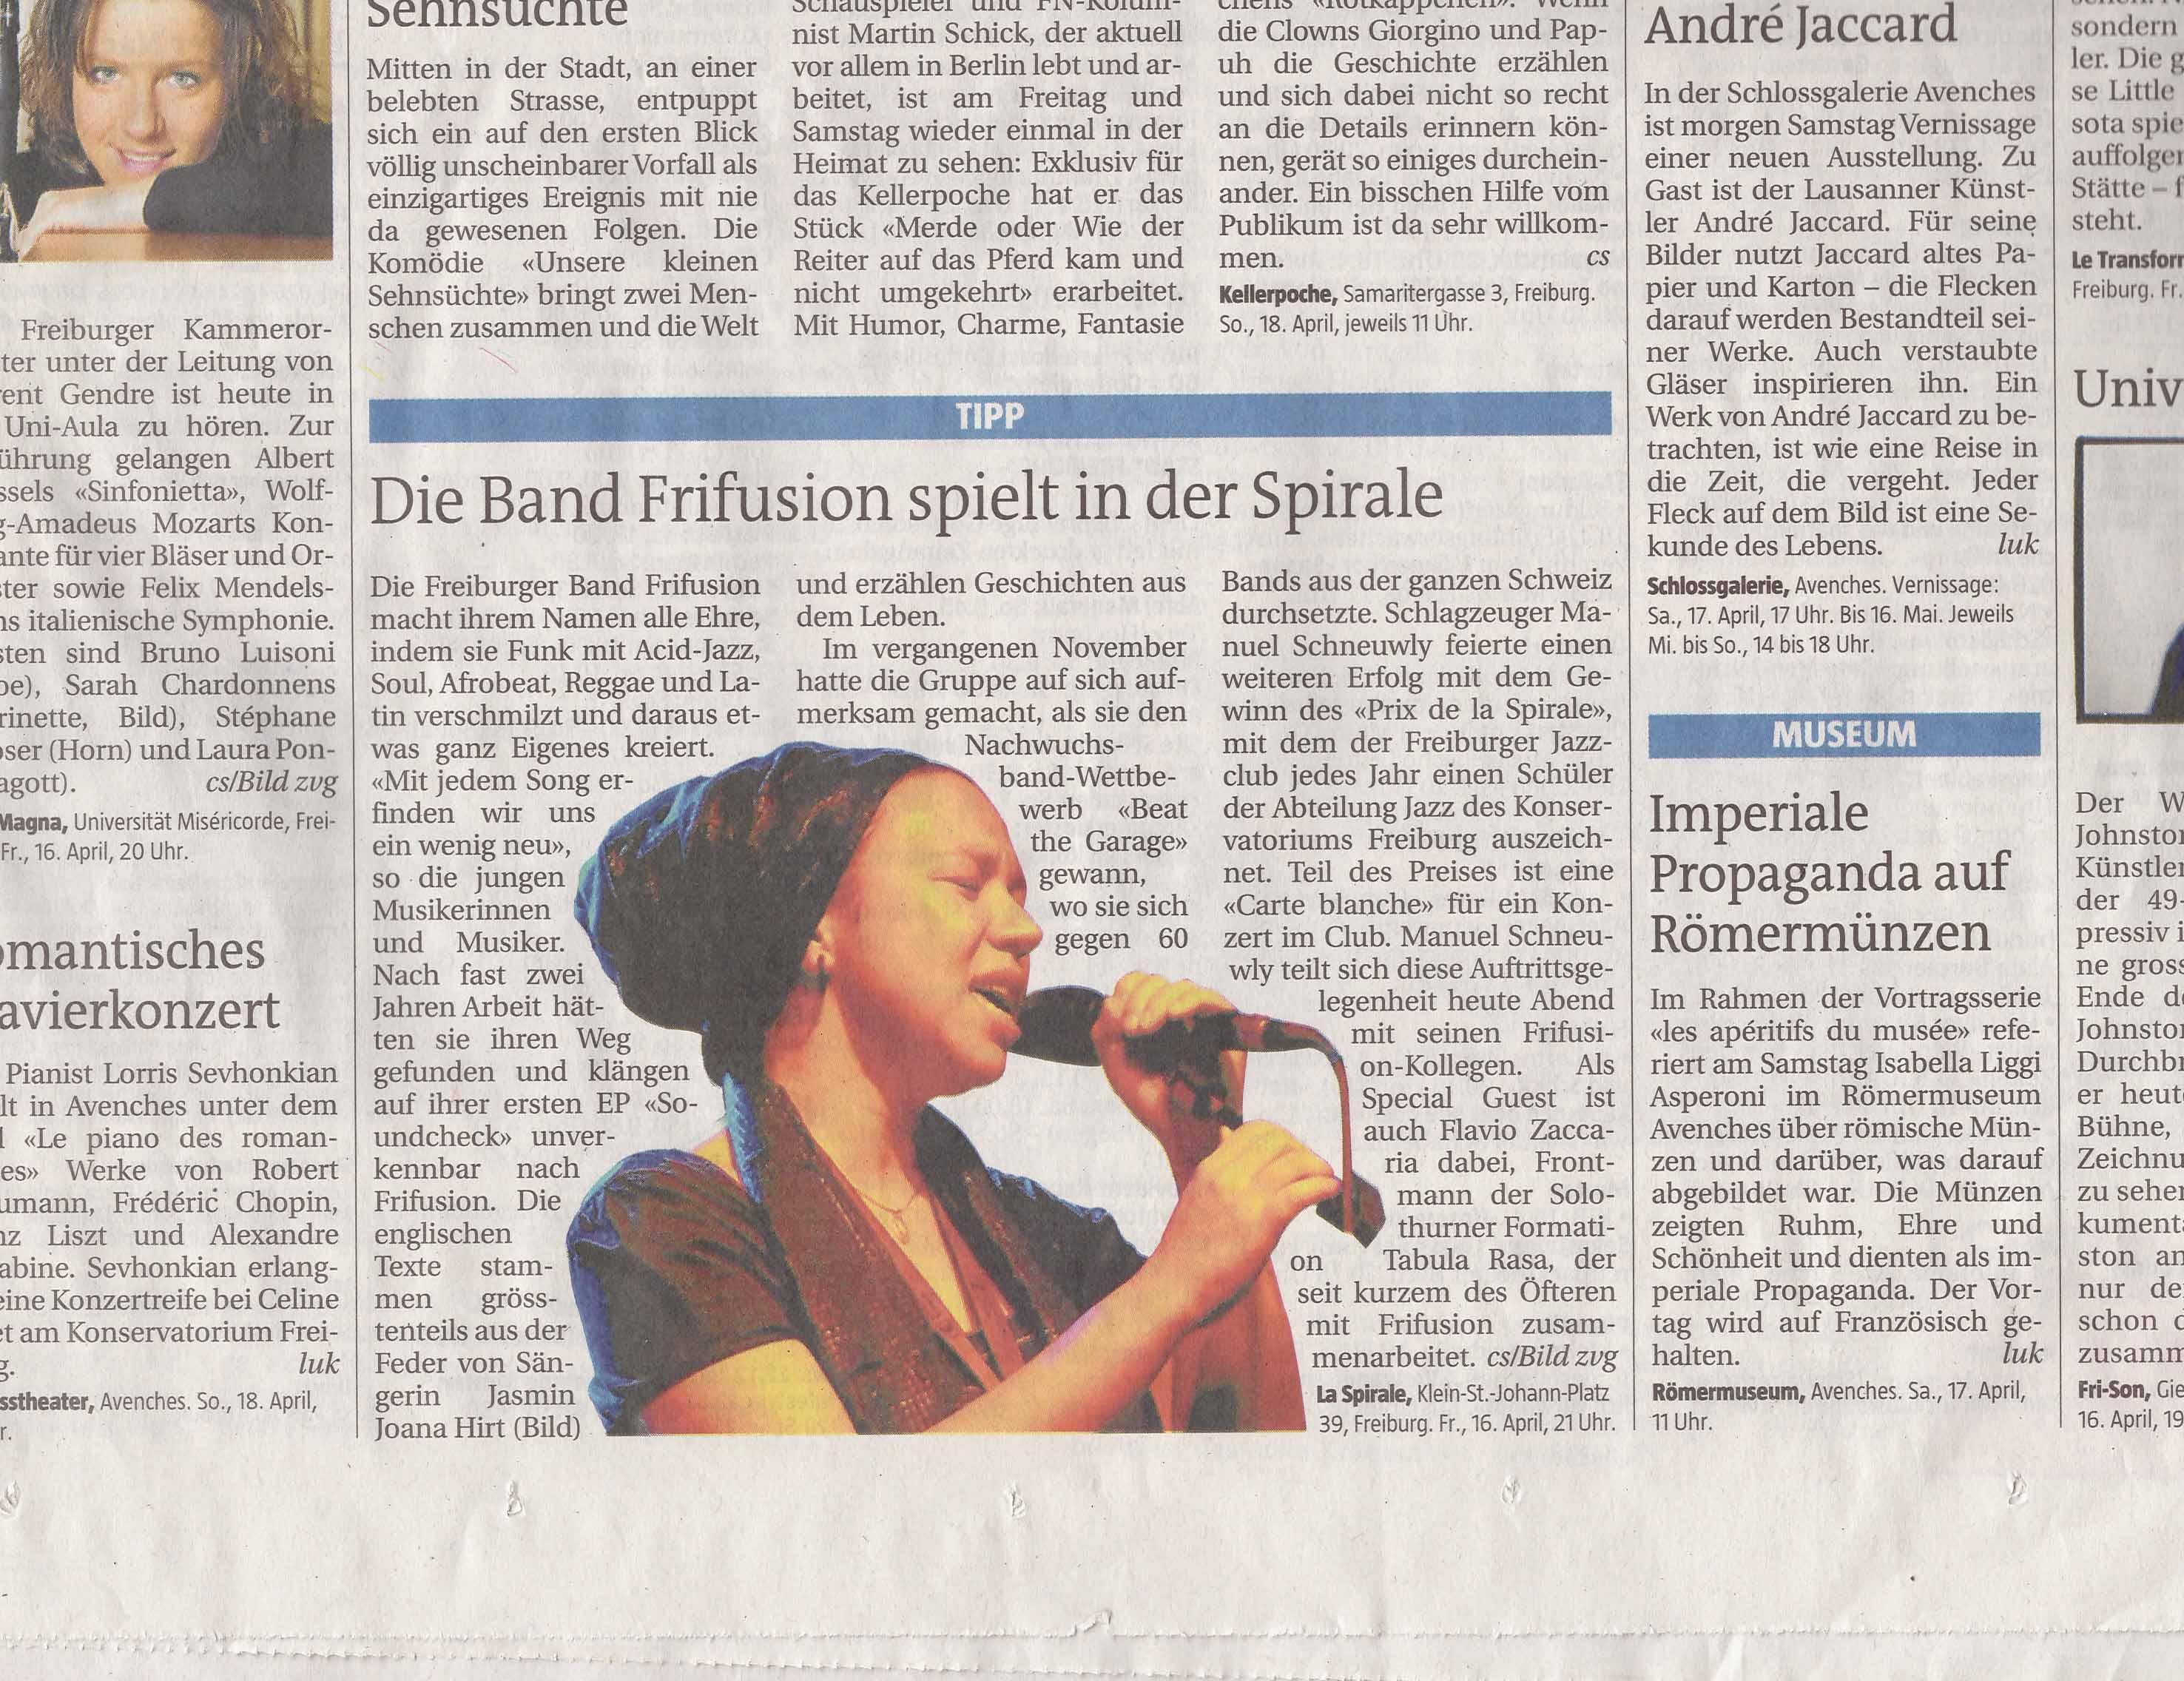 Freiburger Nachrichten Jasmin Joana Hirt Frifusion Bericht